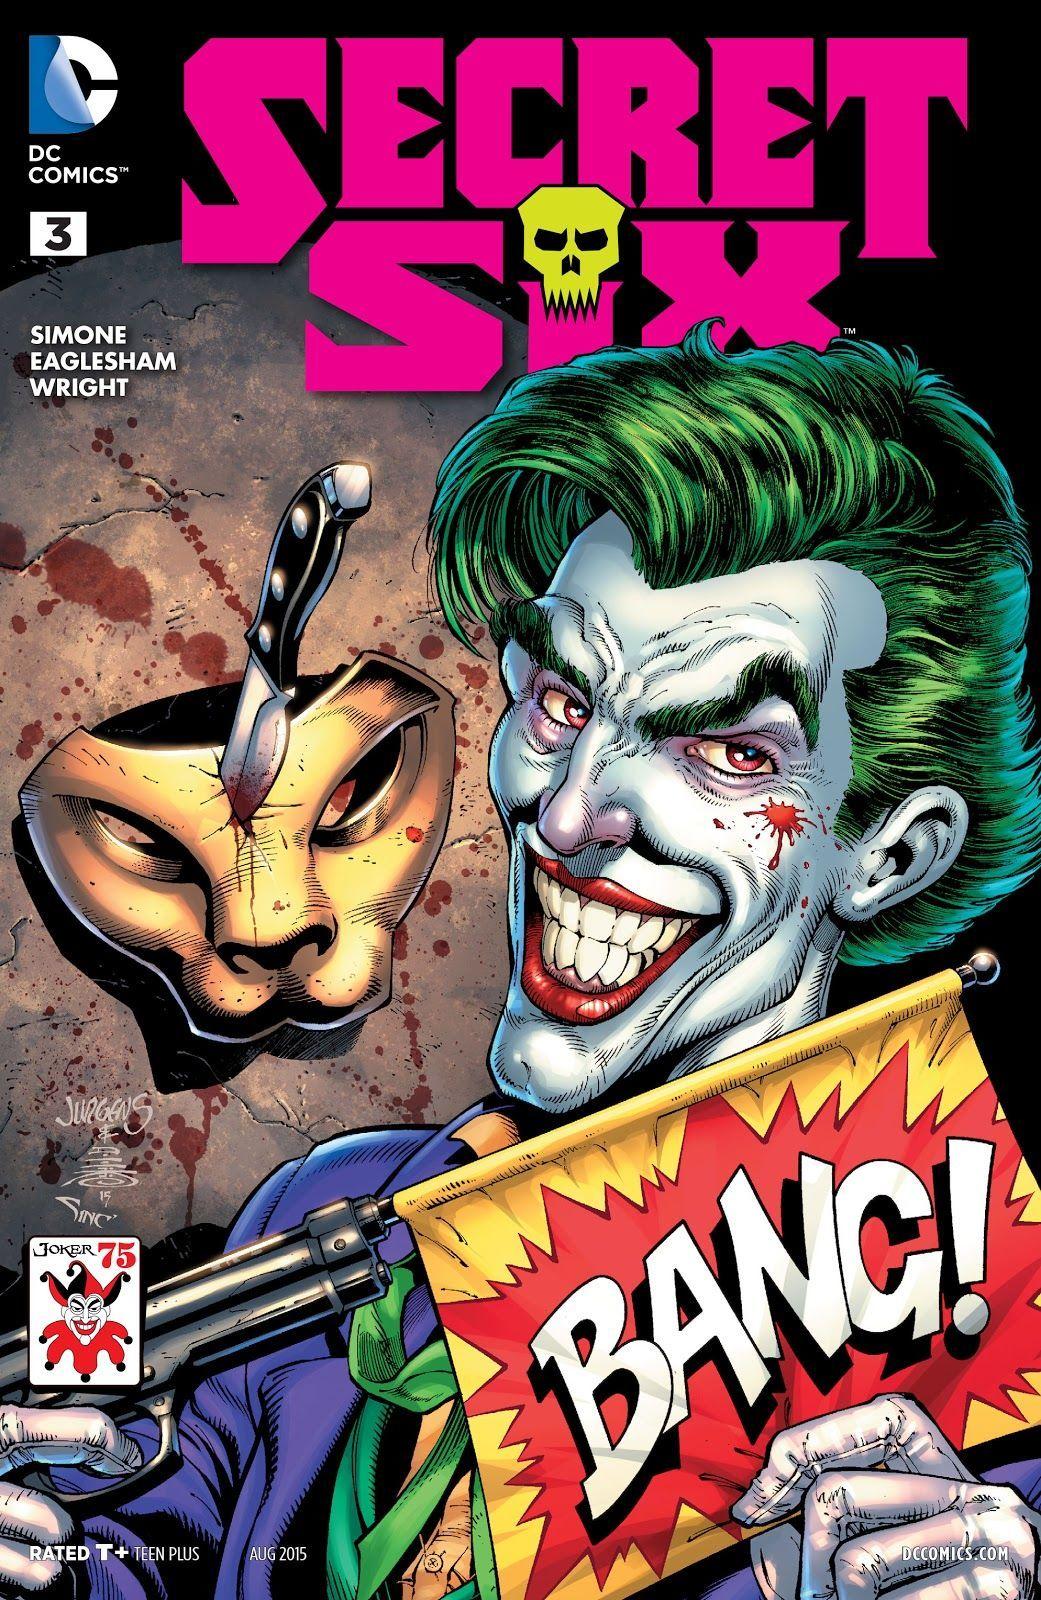 Secret Six #3 (2015) (Writer Gail Simone, Artist Dale Eaglesham)